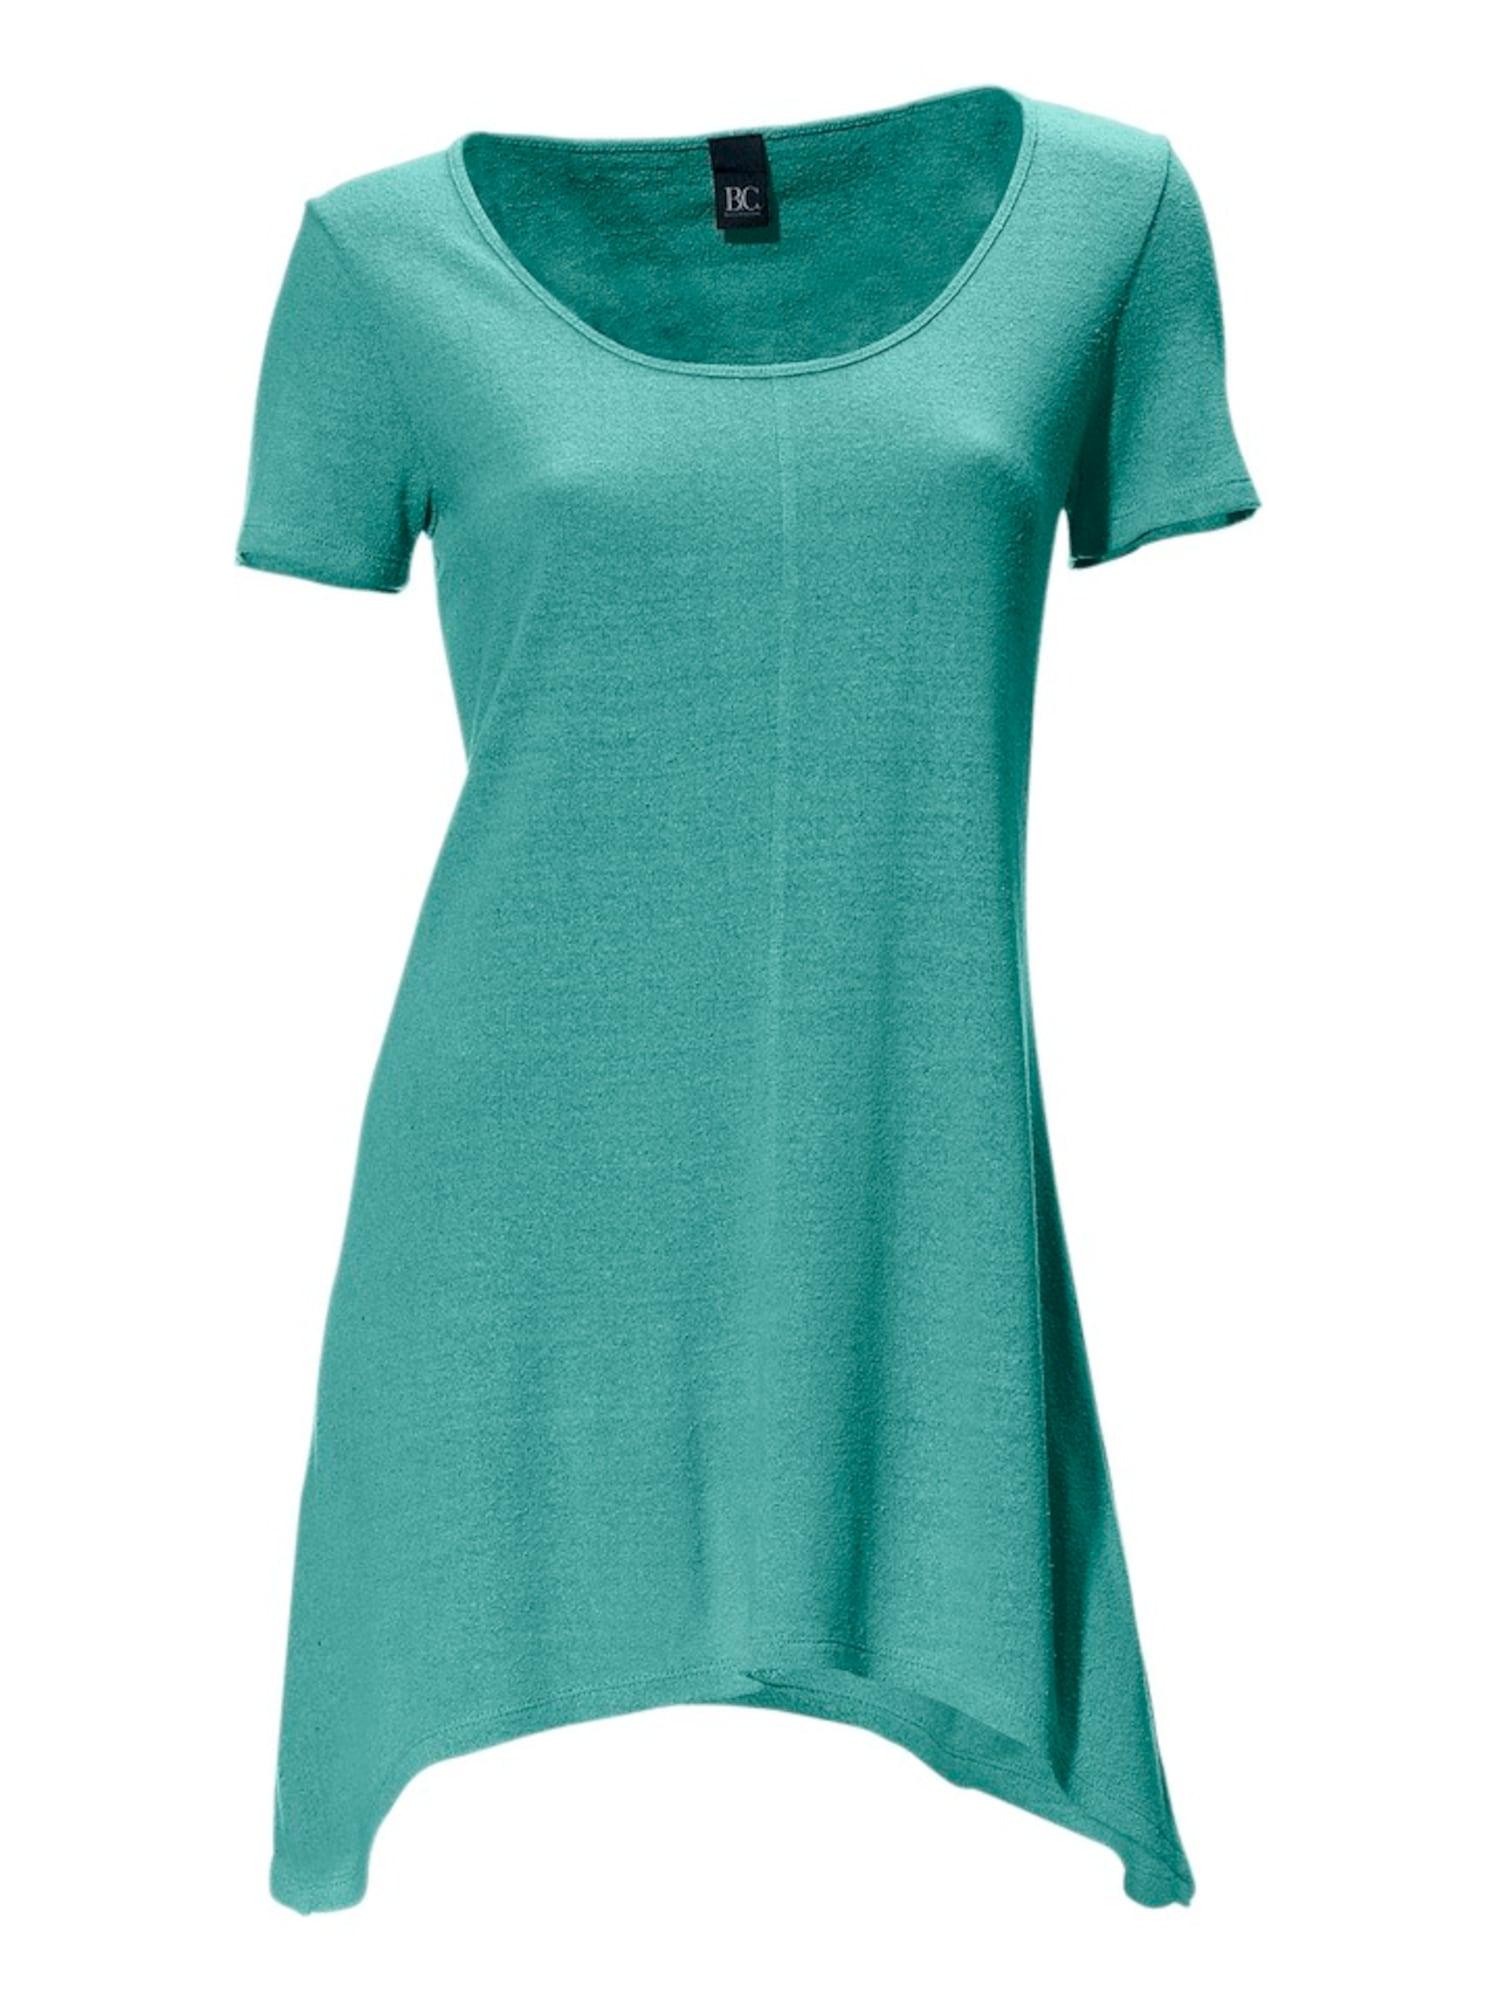 Longshirt | Bekleidung > Shirts > Longshirts | heine